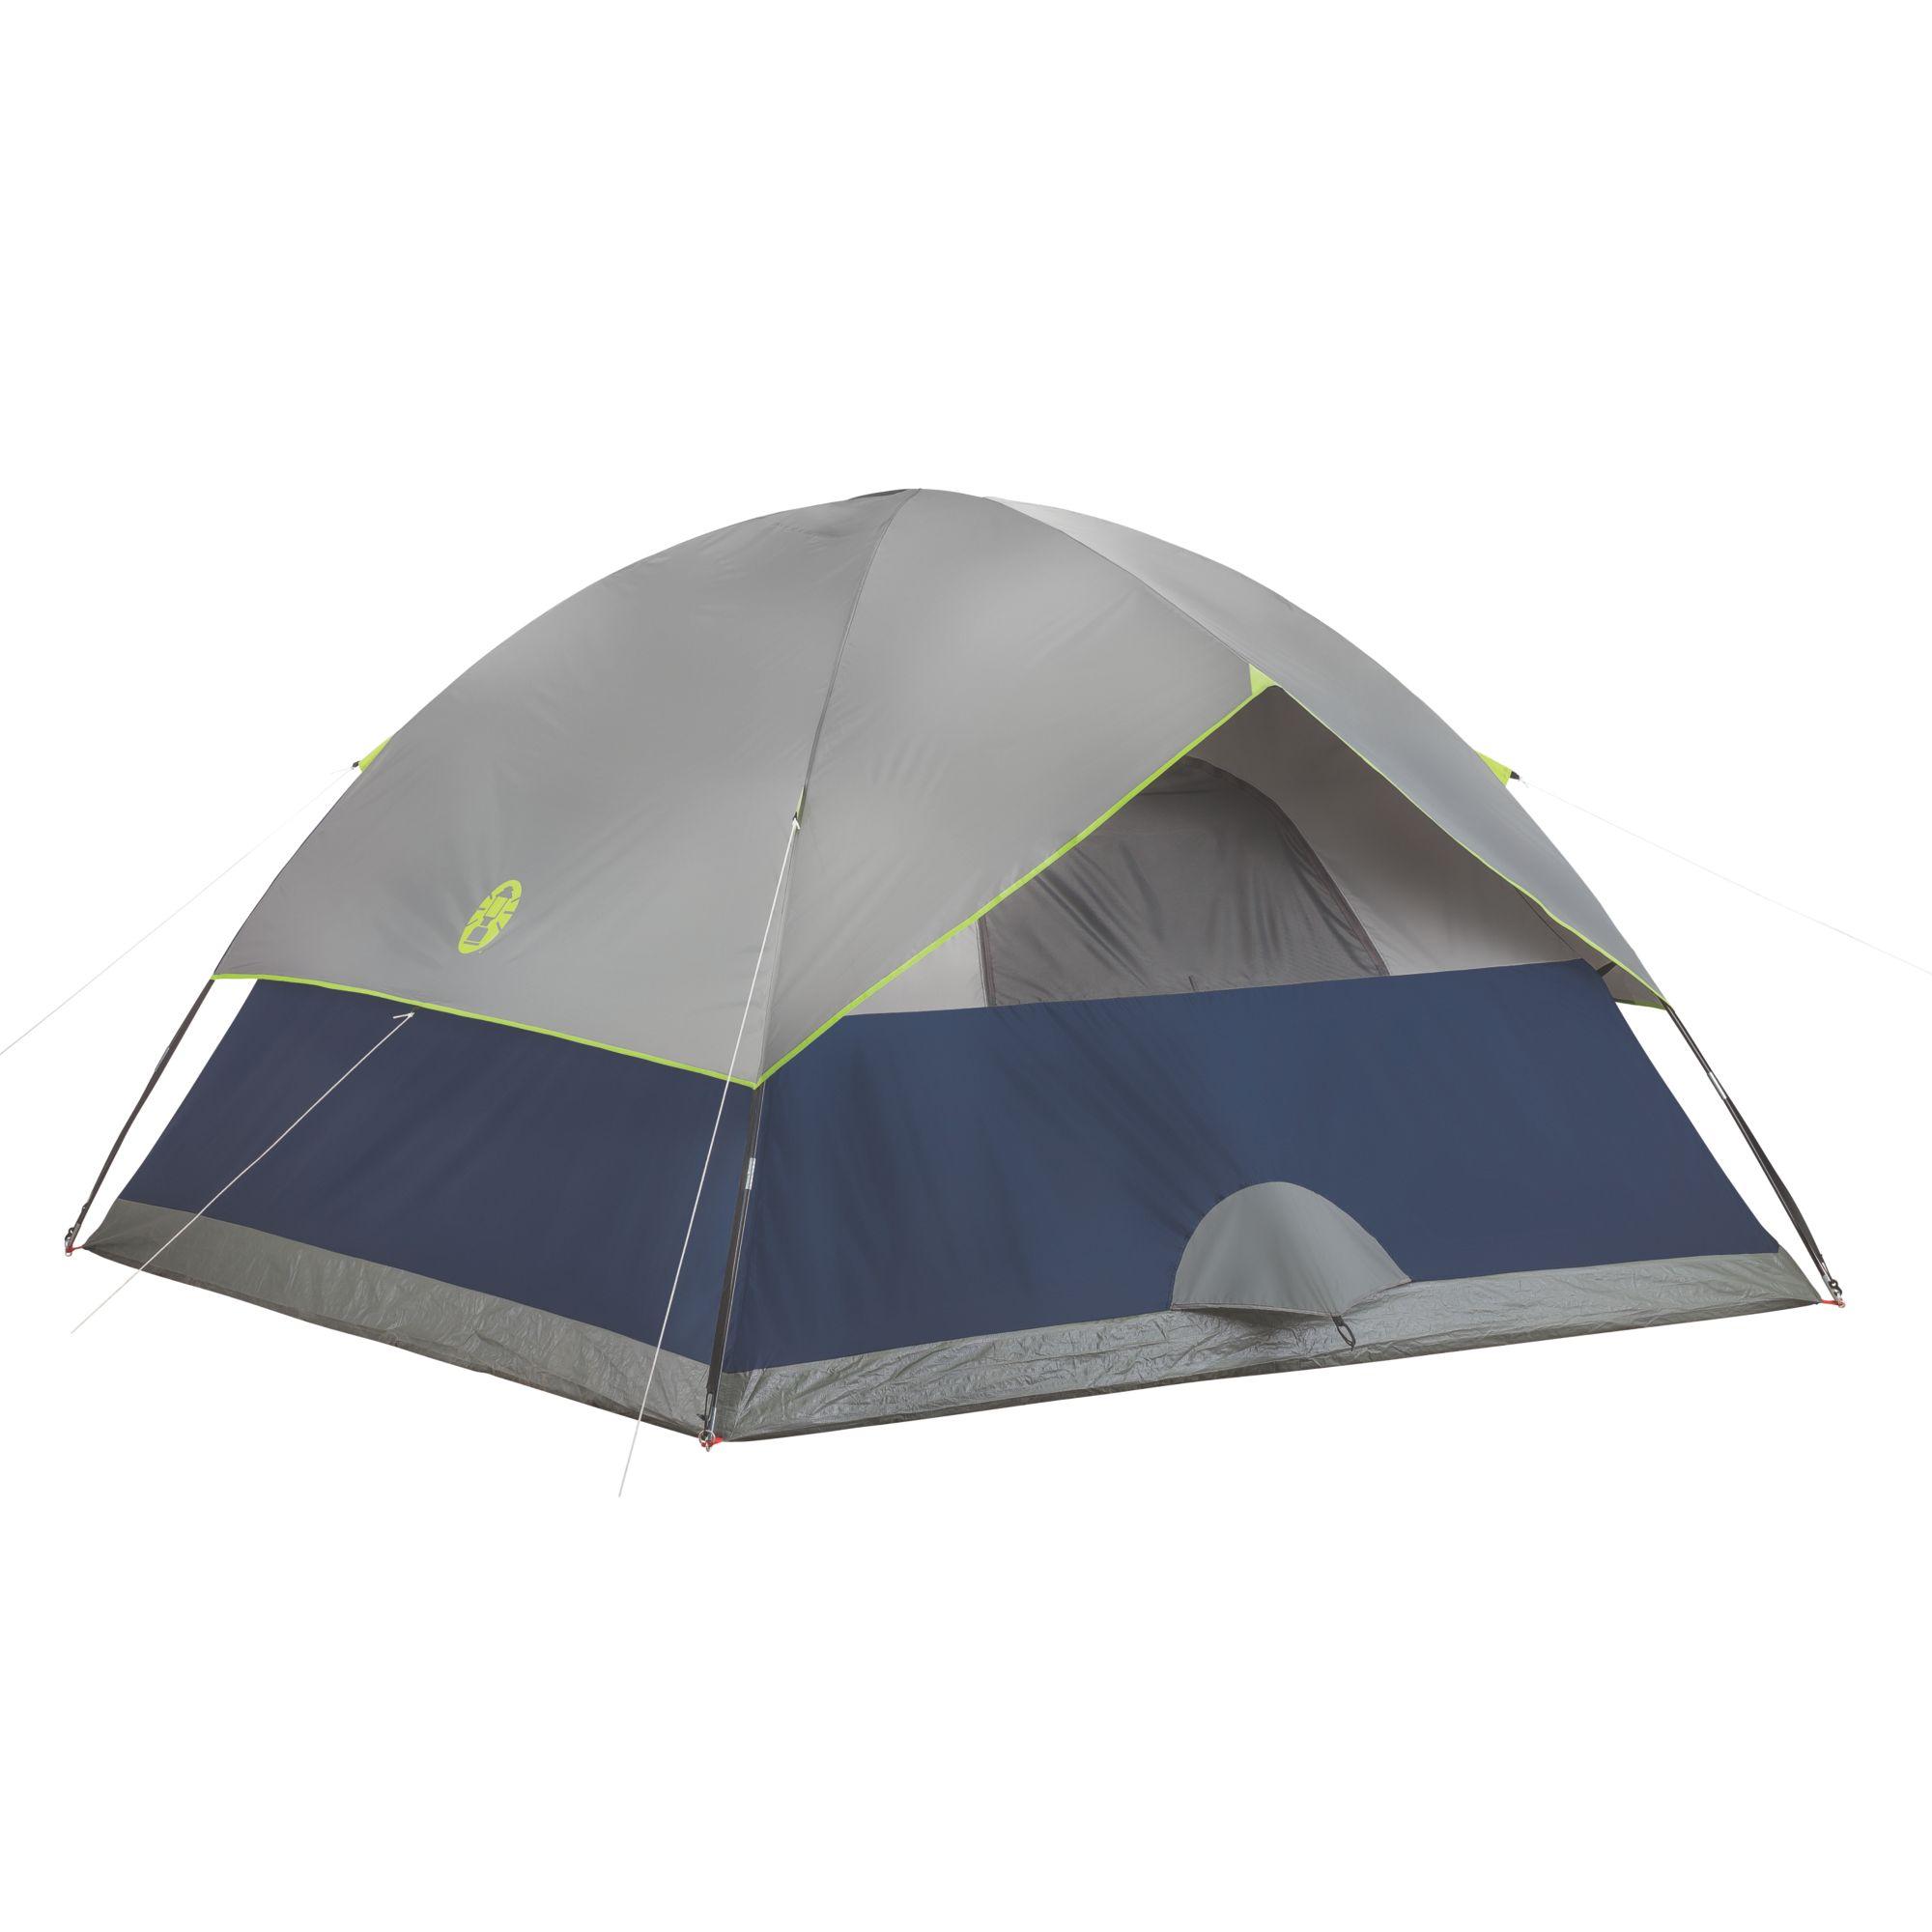 new photos 28587 09a72 Sundome® 6-Person Dome Tent | Coleman